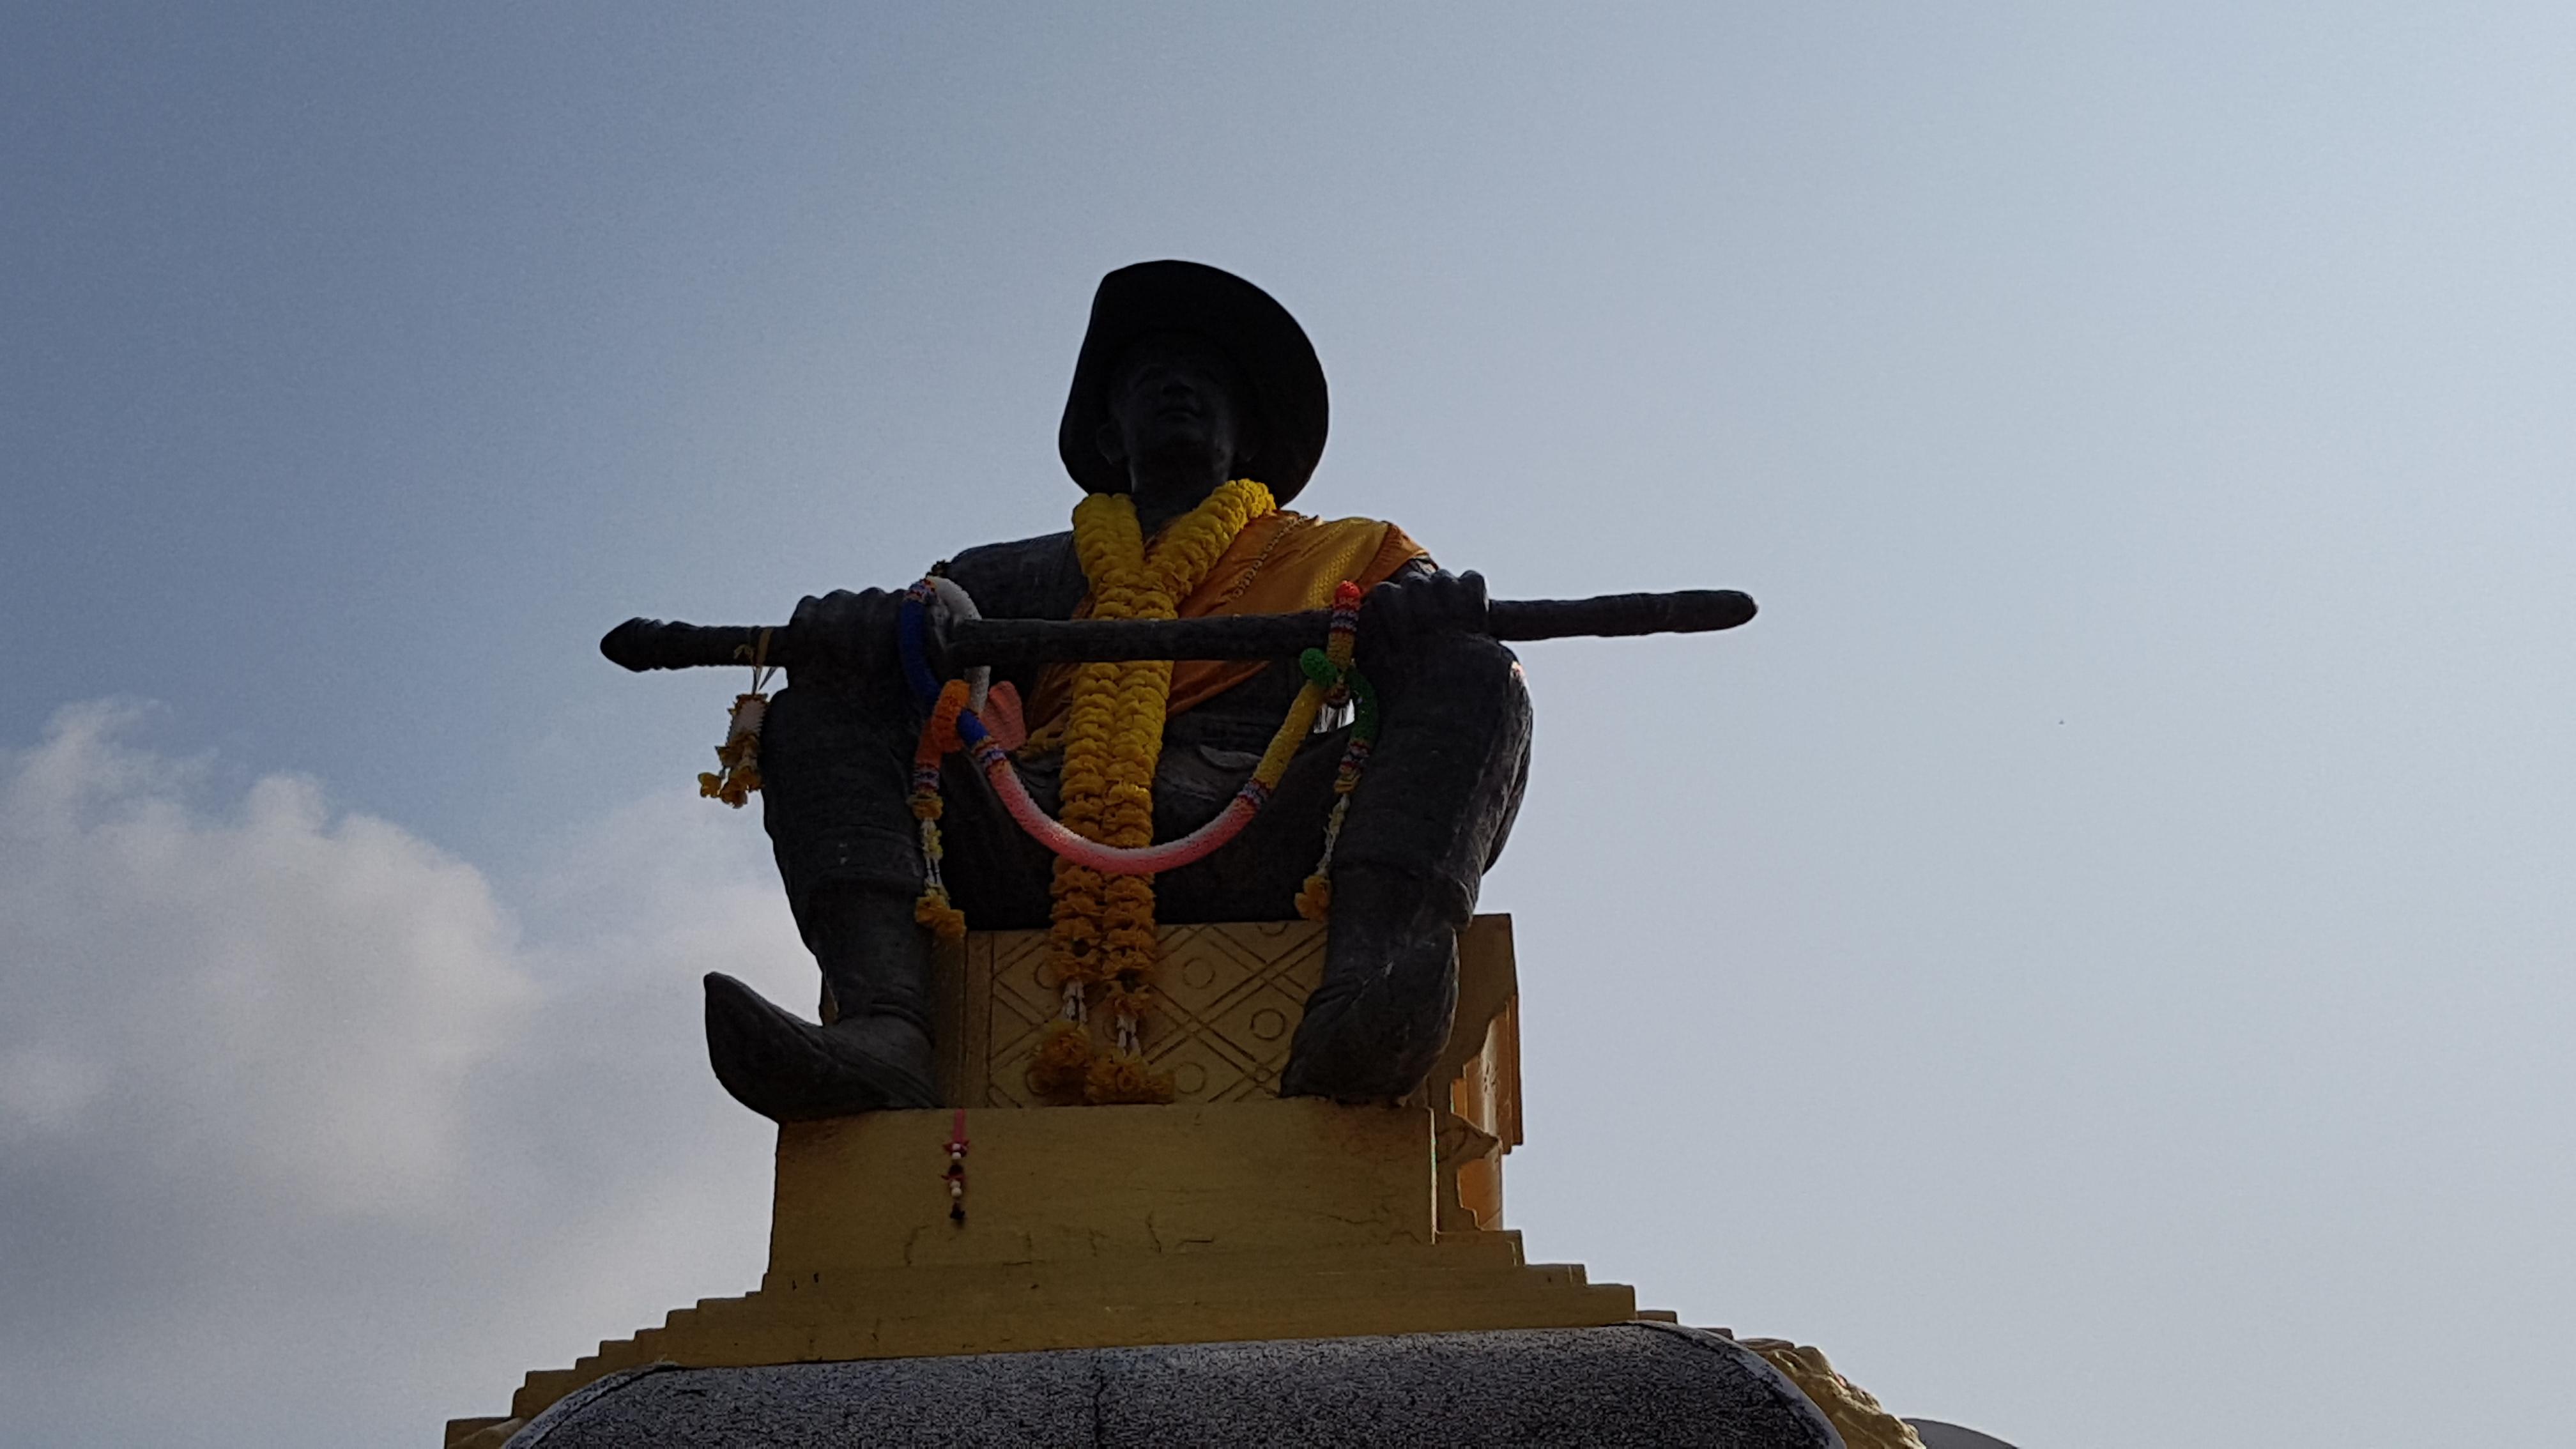 do nation, naga, Phra Chedi Lokha Chulamani, that luang festival, Wat That Luang Neua, Wat That Luang Tai, [라오스 비엔티안] 가장 신성한 건축물, 가격, 가루다, 가이드북, 가장 신성한 건축물, 고급 베개, 공사중, 공양, 금불상, 기념 사진, 깨달음, 꽃, 꽃다발, 나가, 노출, 단체관광, 대거, 대리만족, 대보름, 도깨비, 돌덩이, 동상, 두리안, 두리안 사랑, 두리안 성애자, 뒷좌석, 딱밧, 라오스, 라오스 문화, 라오스 사람, 라오스 역사, 라오스 인민민주주의 공화국, 라오스어, 라오스에서 가장 추앙받는 왕, 람부탄, 루앙 축제, 마지막 아침, 무료, 바나나 줄기, 박공, 발 포즈, 방생, 배낭여행, 배달지, 뱀, 버마, 벌, 법륜, 부처님, 부처님 머리, 분 탓 루앙, 불교 이야기, 불교신자, 비슈누, 비엔티안, 빨간색 환타, 사람, 사리, 사바이디, 사원, 사진, 상징, 성벽, 세종대왕, 세탓티랏, 세탓티랏 왕, 수행, 순박, 승려, 식물, 신성, 신성함, 싸롱, 썽태우, 쎄타티랏, 씨암, 안탑, 앞좌석, 어머니, 엄마, 업적, 연꽃봉오리, 영어, 와불, 왓 탓 루앙 느아, 왓 탓 루앙 따이, 외국인 차별, 용, 위대한 탑, 의문, 인파, 입장료, 장식, 전통 복장, 정교, 조각, 지붕, 짐칸, 찌찌, 찌찌노출, 참배, 채비, 처마, 첨탑, 최초 통일왕국, 침략, 큰 나무, 탁발, 탓 루앙, 태국, 통일왕국, 특이한 드레스, 파 탓 루앙, 프라 쩨디 로카쭐라마니, 프라쌋 프앙, 프랑스, 한국인, 한국인 부부, 화법, 환타, 황금, 황금 장식, 회랑, 흥정, 힌두교, 힌두신